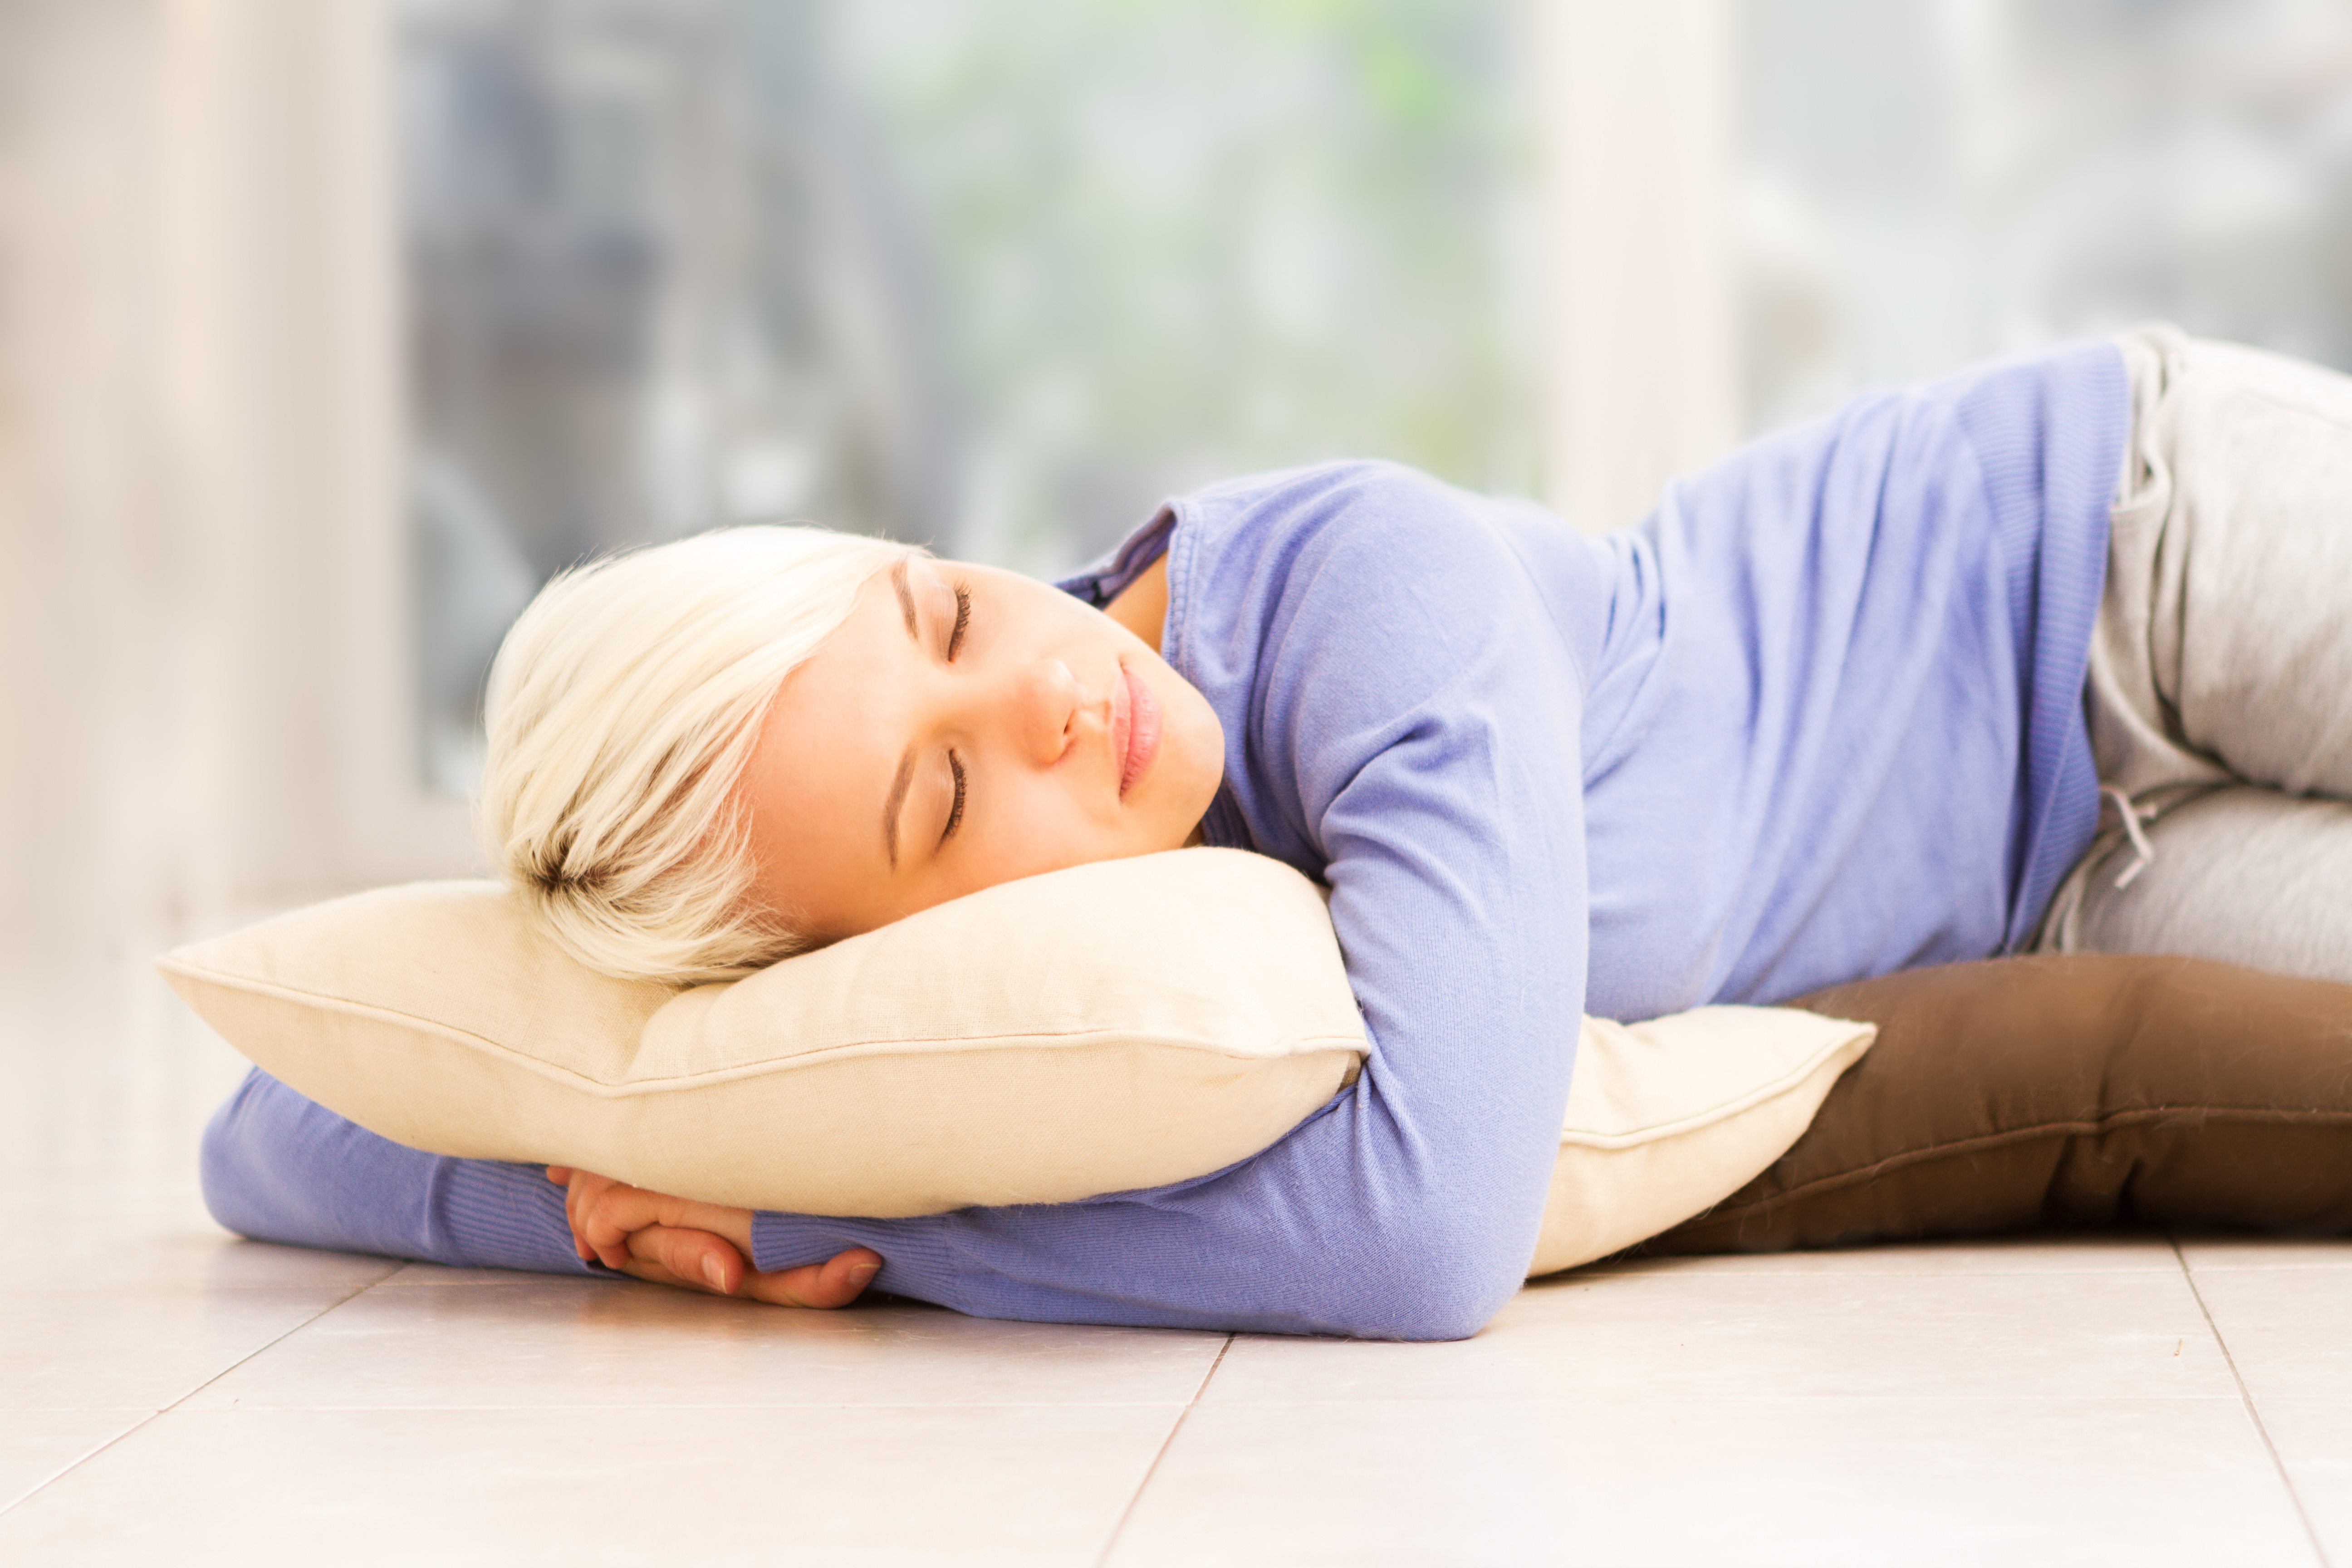 Benefits to Sleeping on the Floor